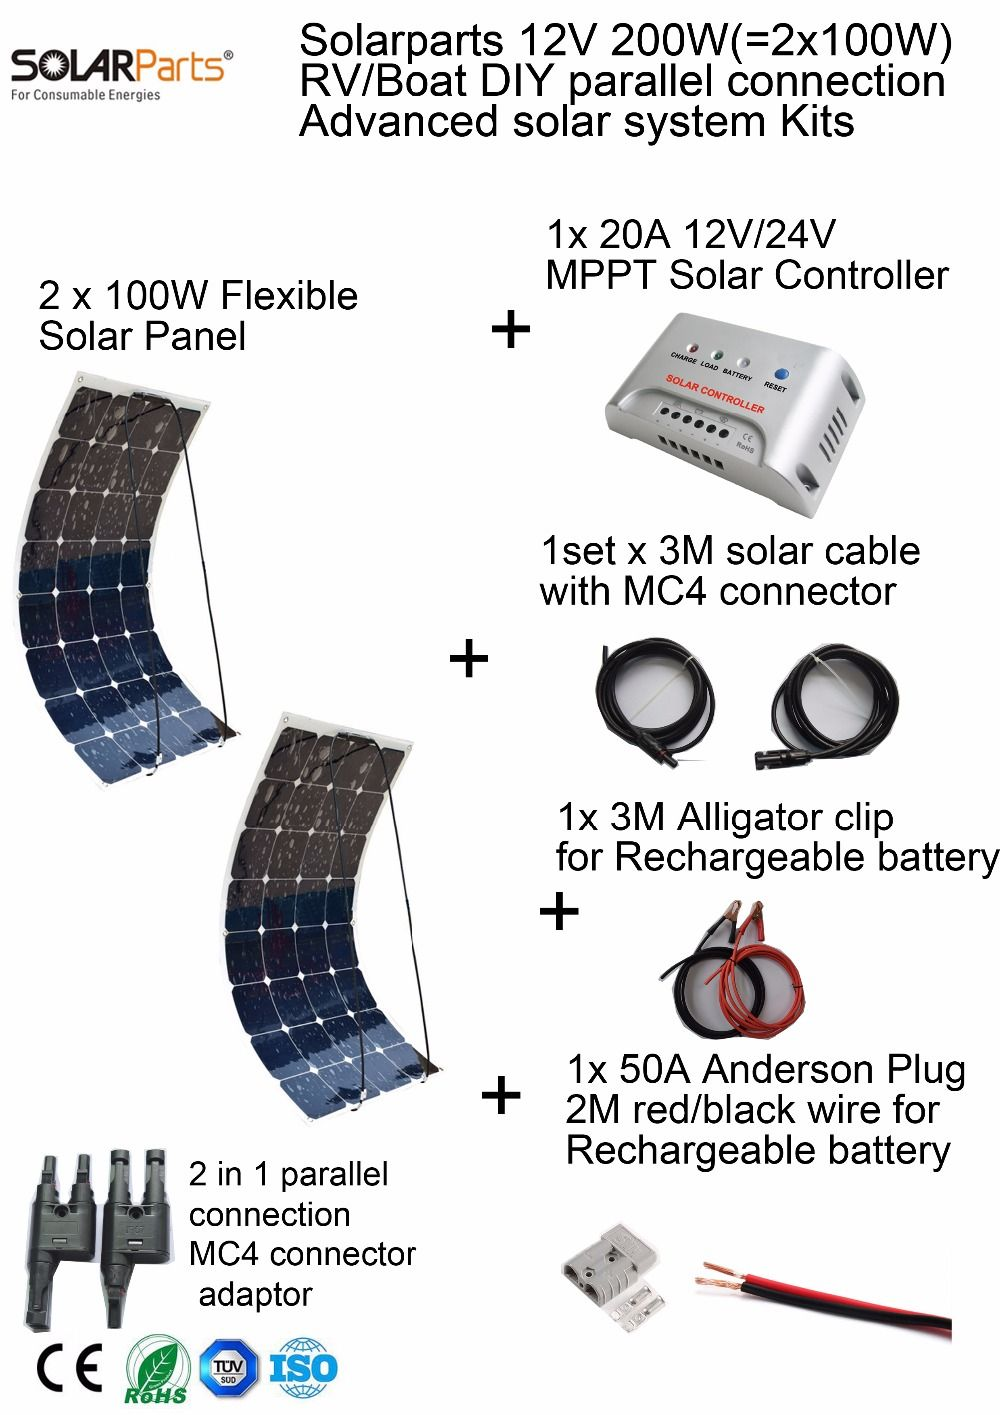 Solarparts 200W DIY RV/Marine Kits Solar System 2x100W flexible solar panel 12V, 1x 20A MPPT solar controller set cables cheap.